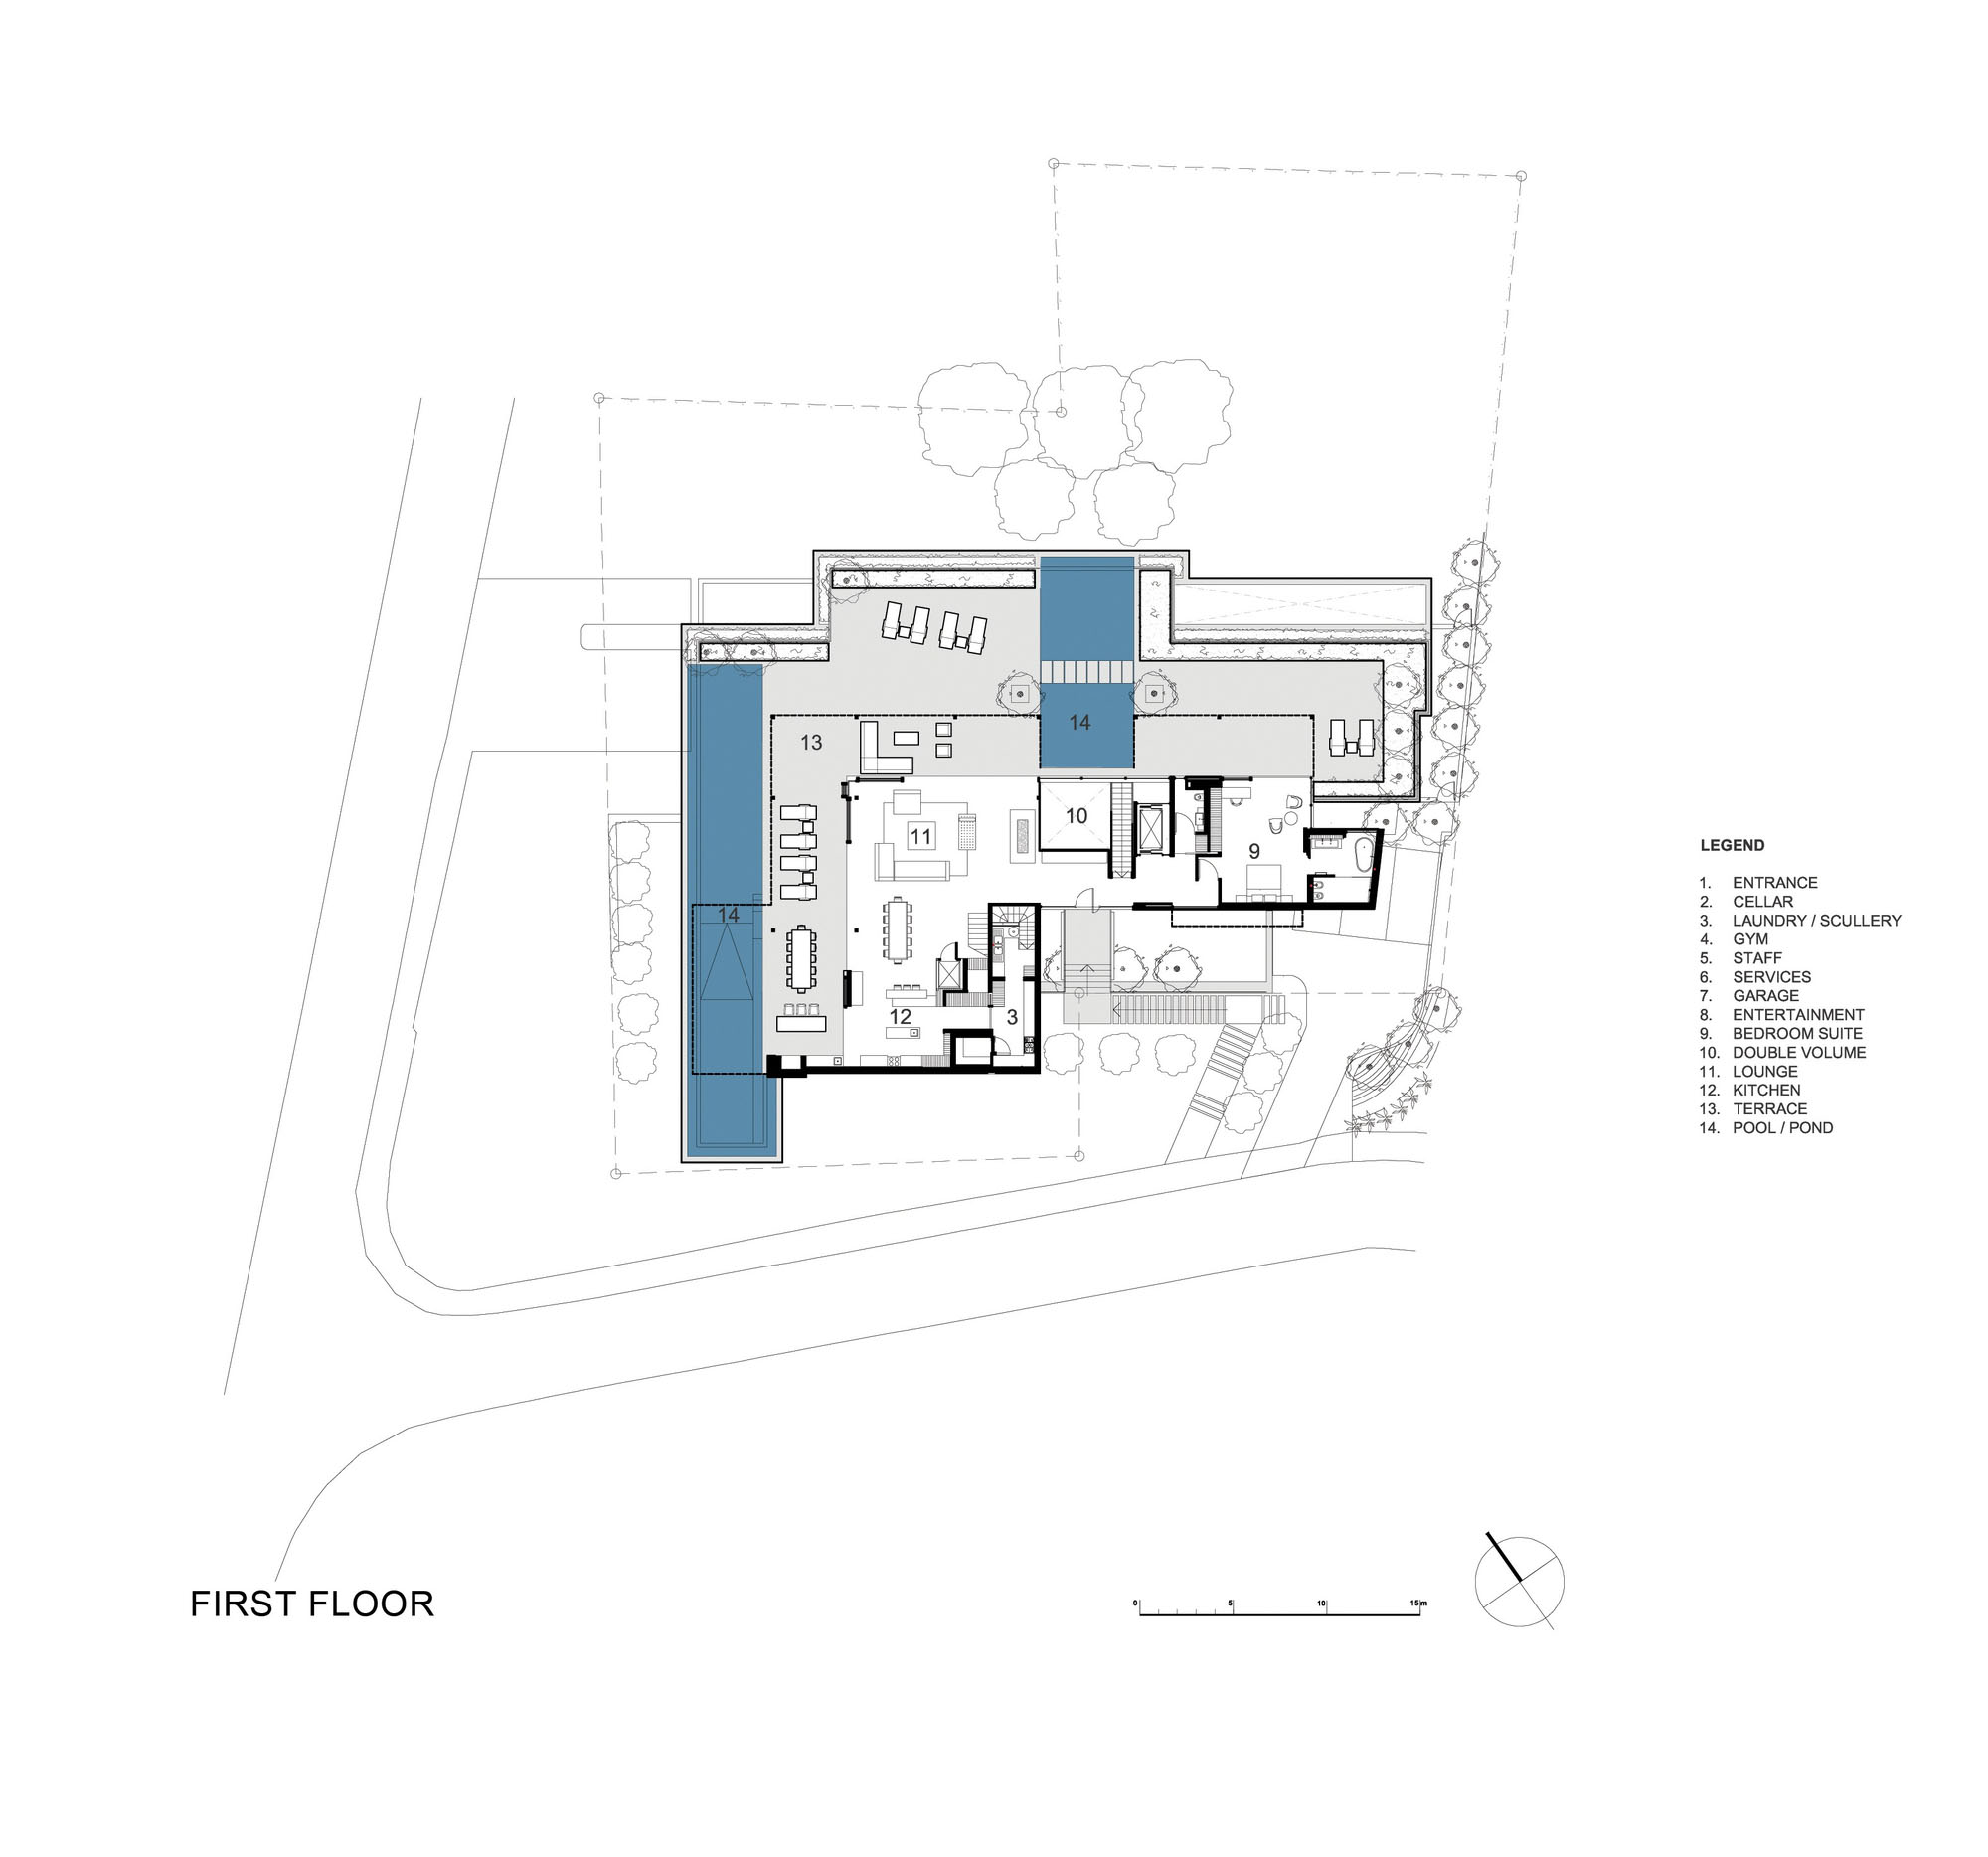 Contemporary Beachfront Home In South Africa  iDesignArch  Interior Design Architecture